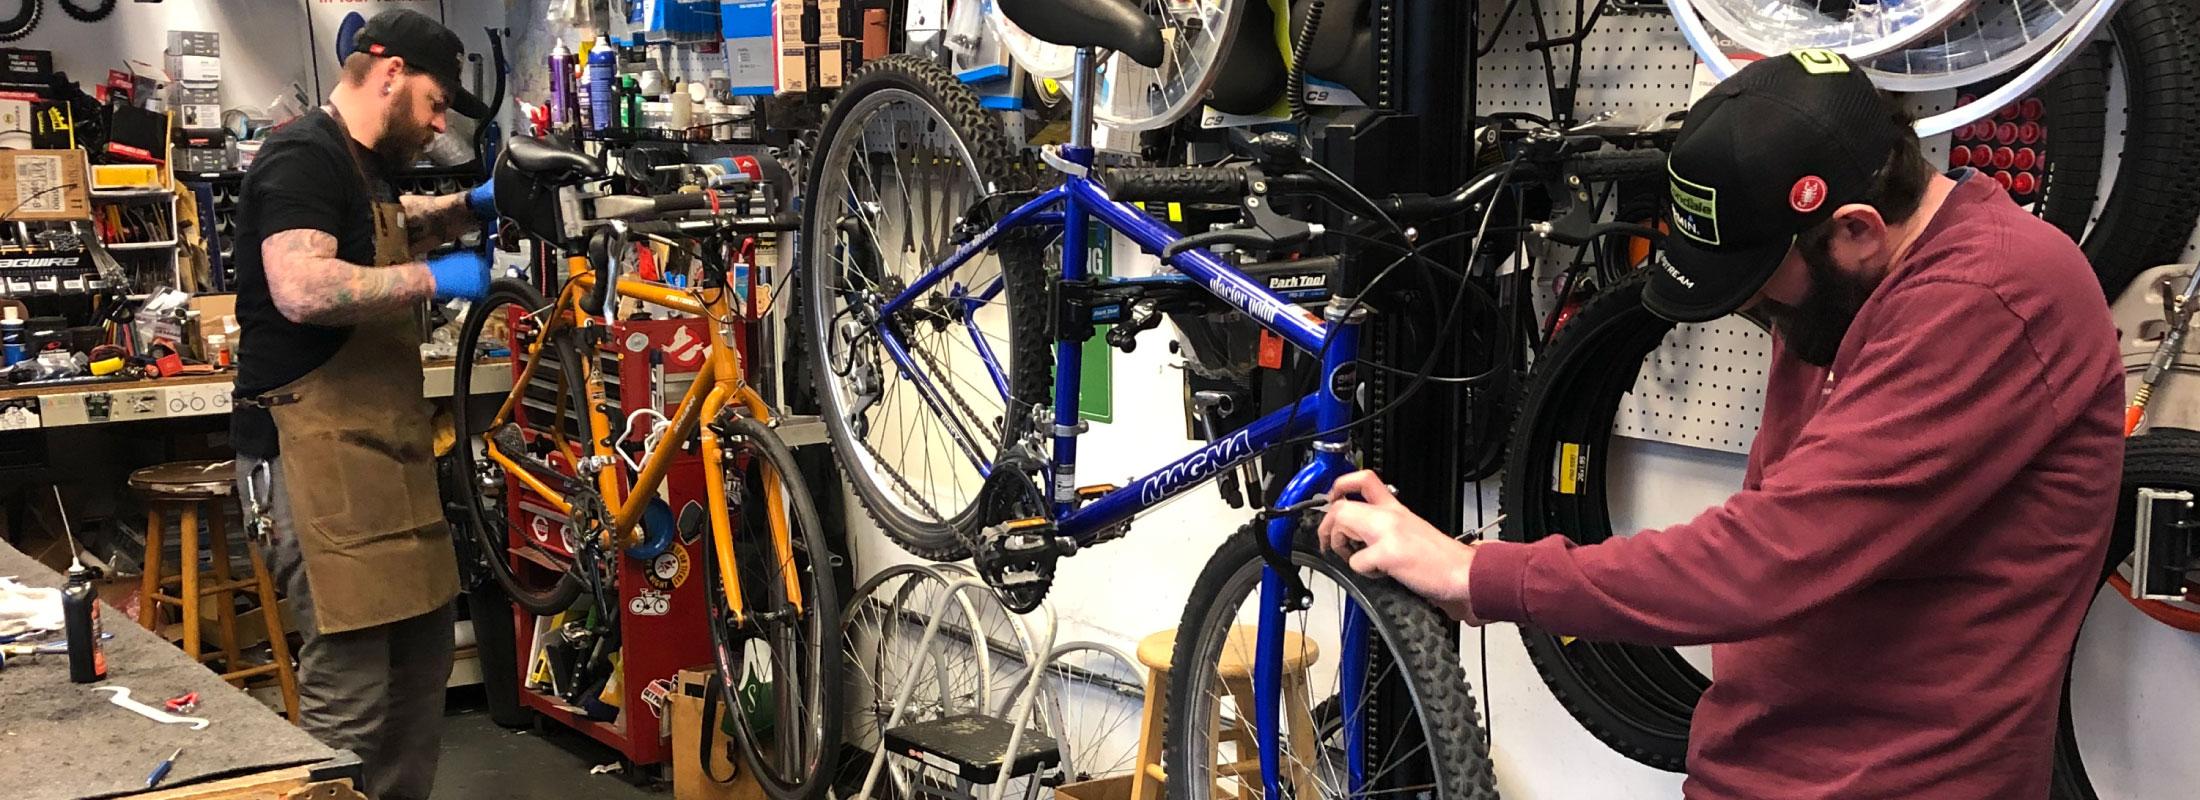 Bicycle Service Hero | The Garage OTR